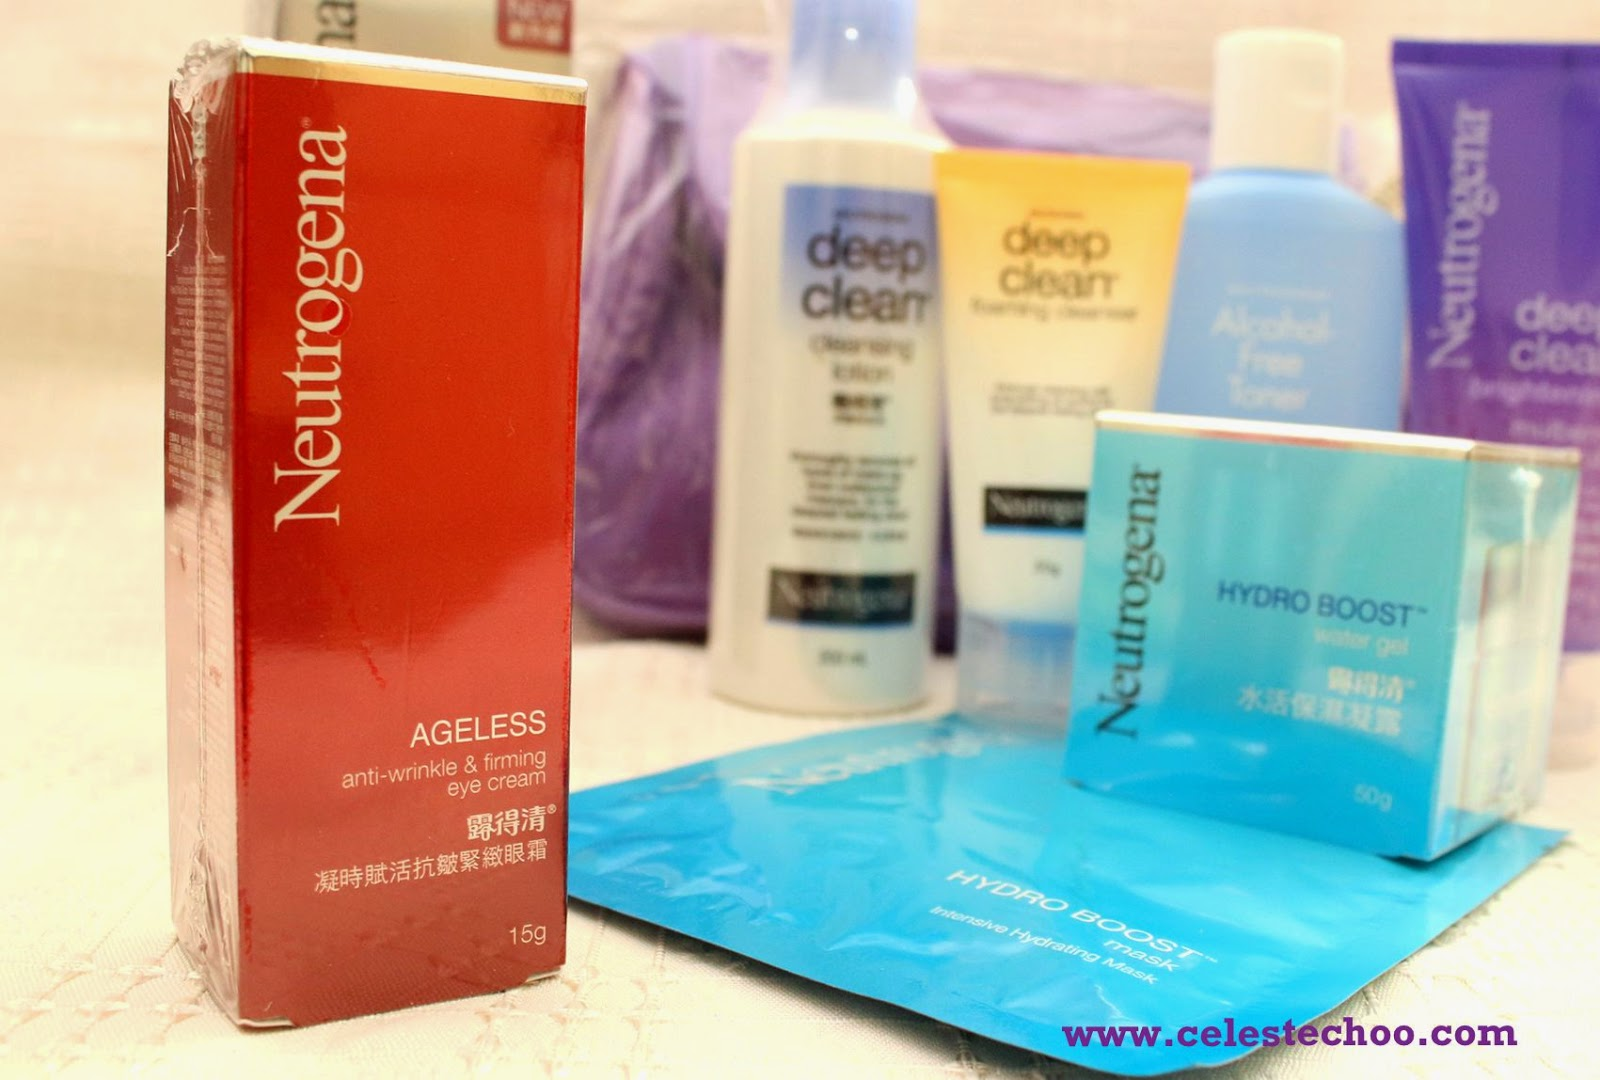 neutrogena_60th_anniversary_ageless_eye_cream